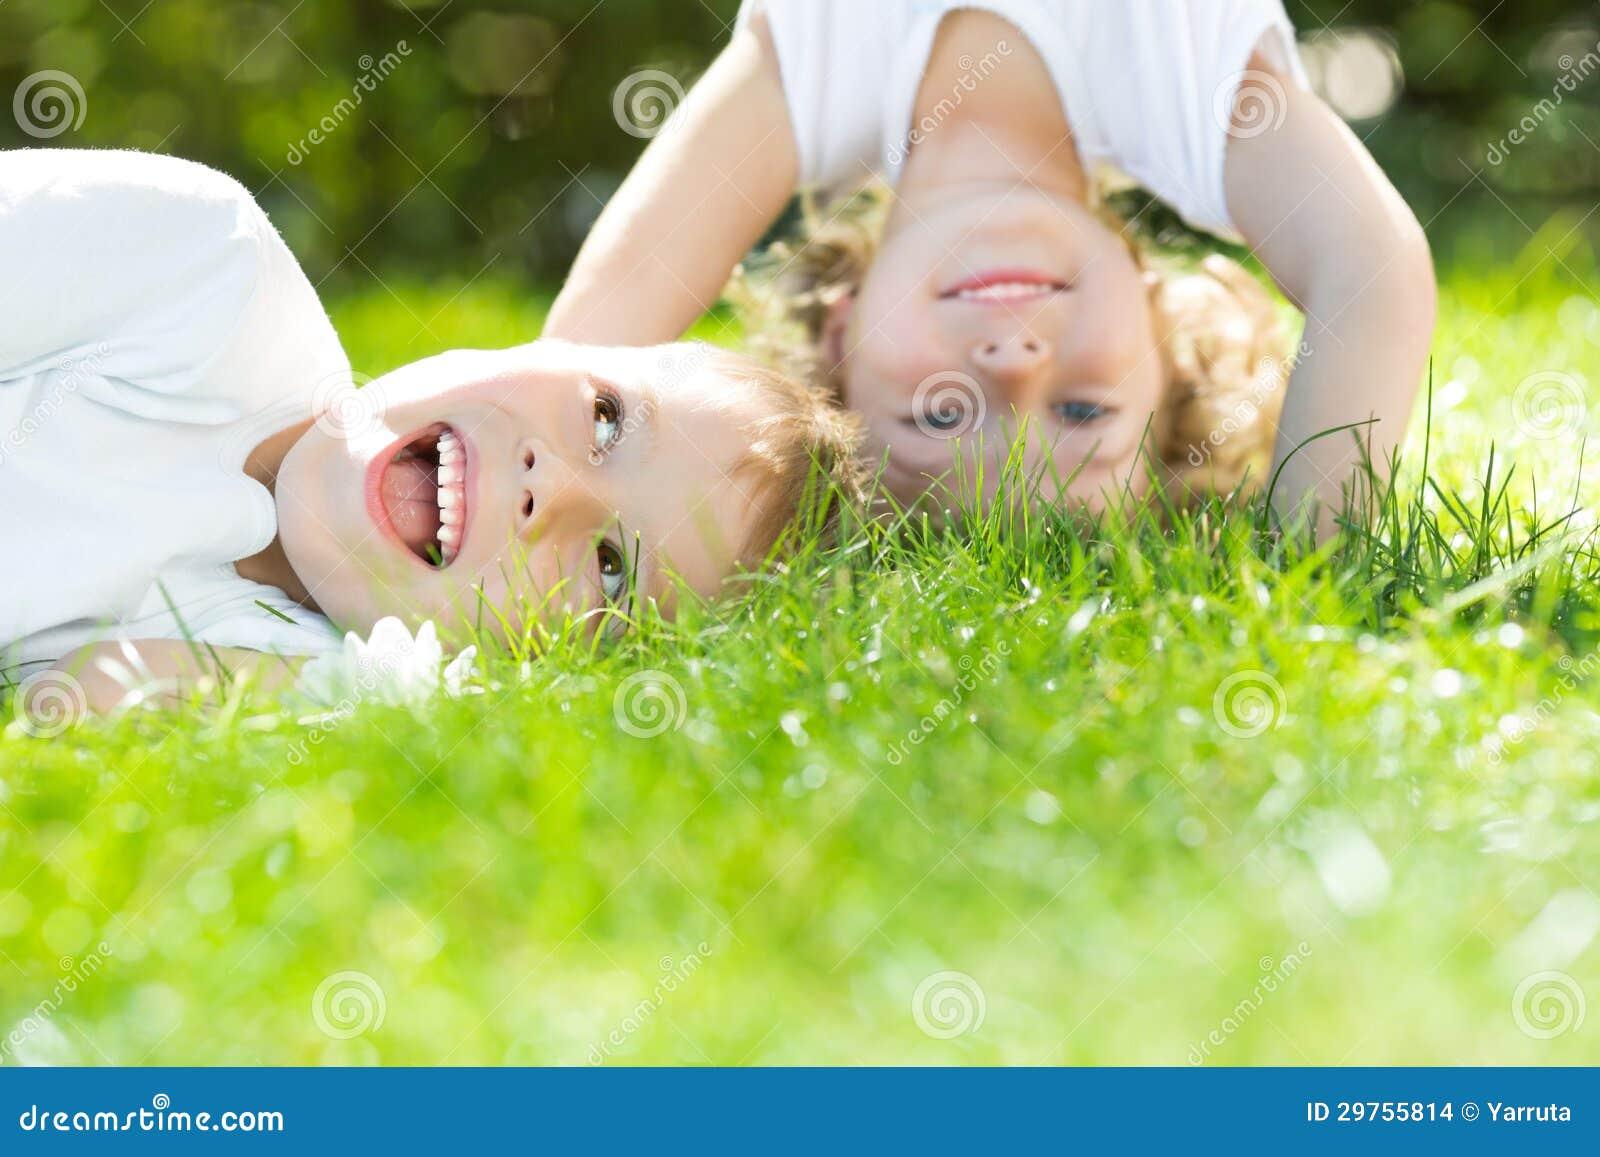 Happy Children Standing Upside Down Stock Images - Image ...